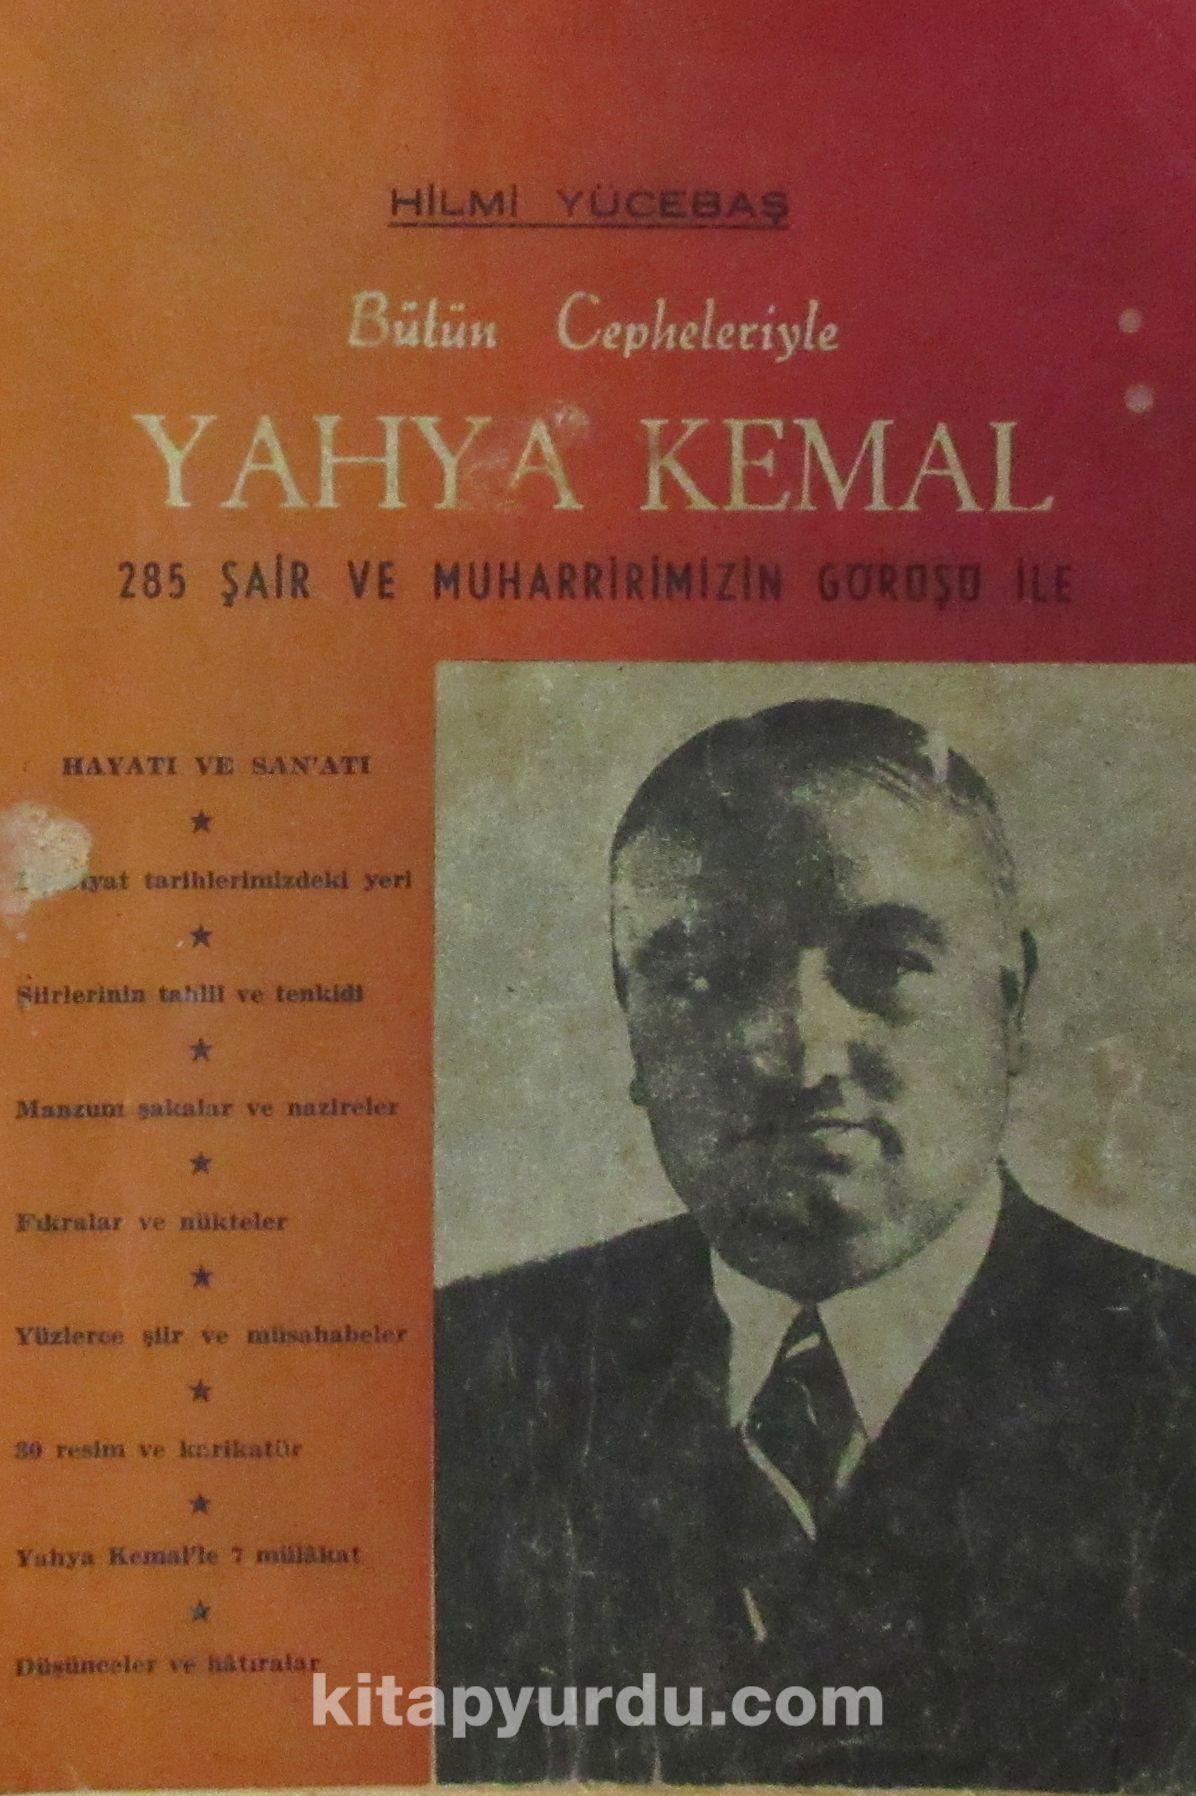 Bütün Cepheleriyle Yahya Kemal (2-A-33) - Hilmi Yücebaş pdf epub